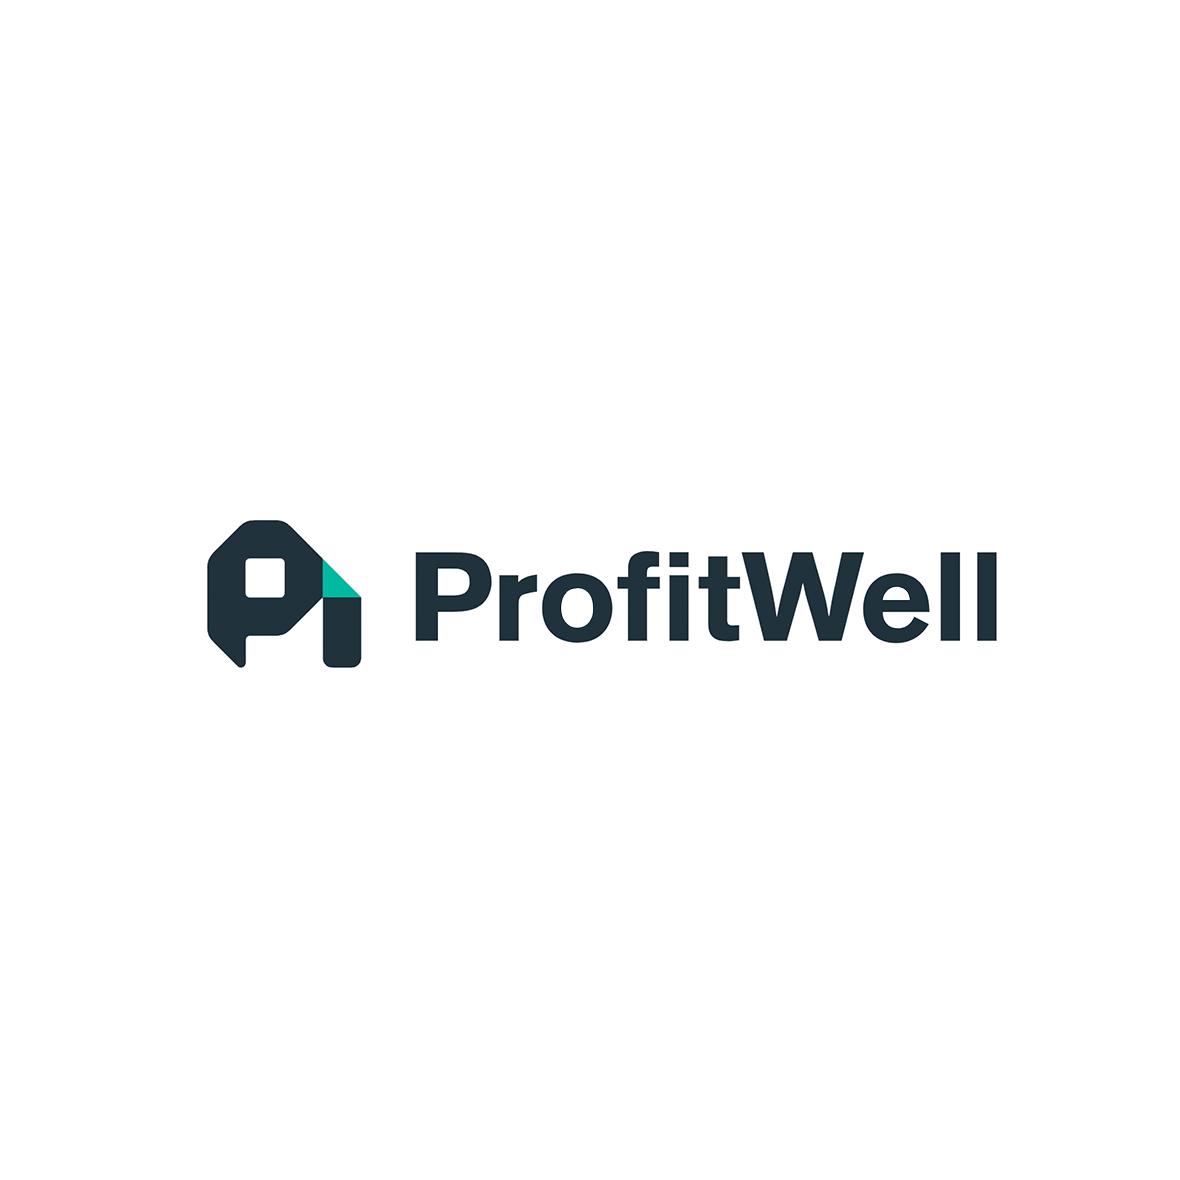 ProfitWell